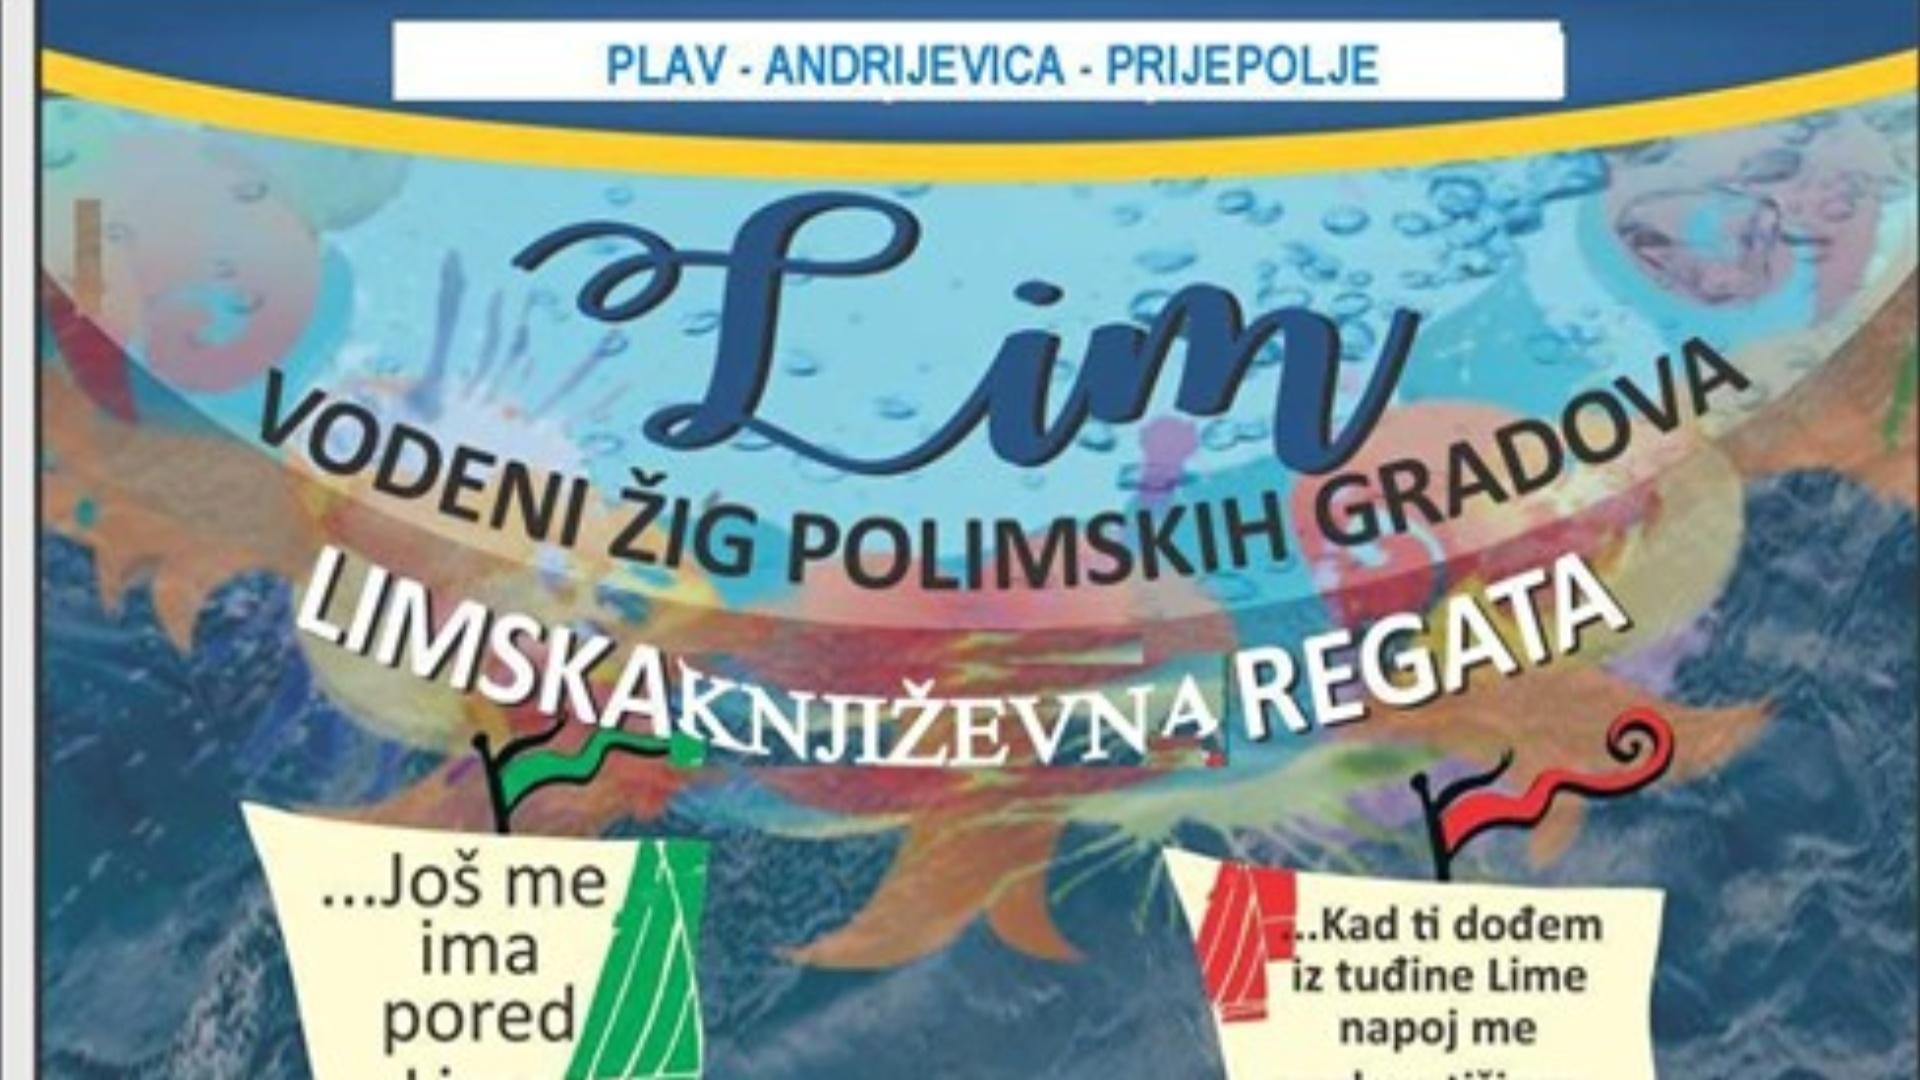 """Лимска књижевна регата 2019"" – Сусрет песника из седам полимских градова"